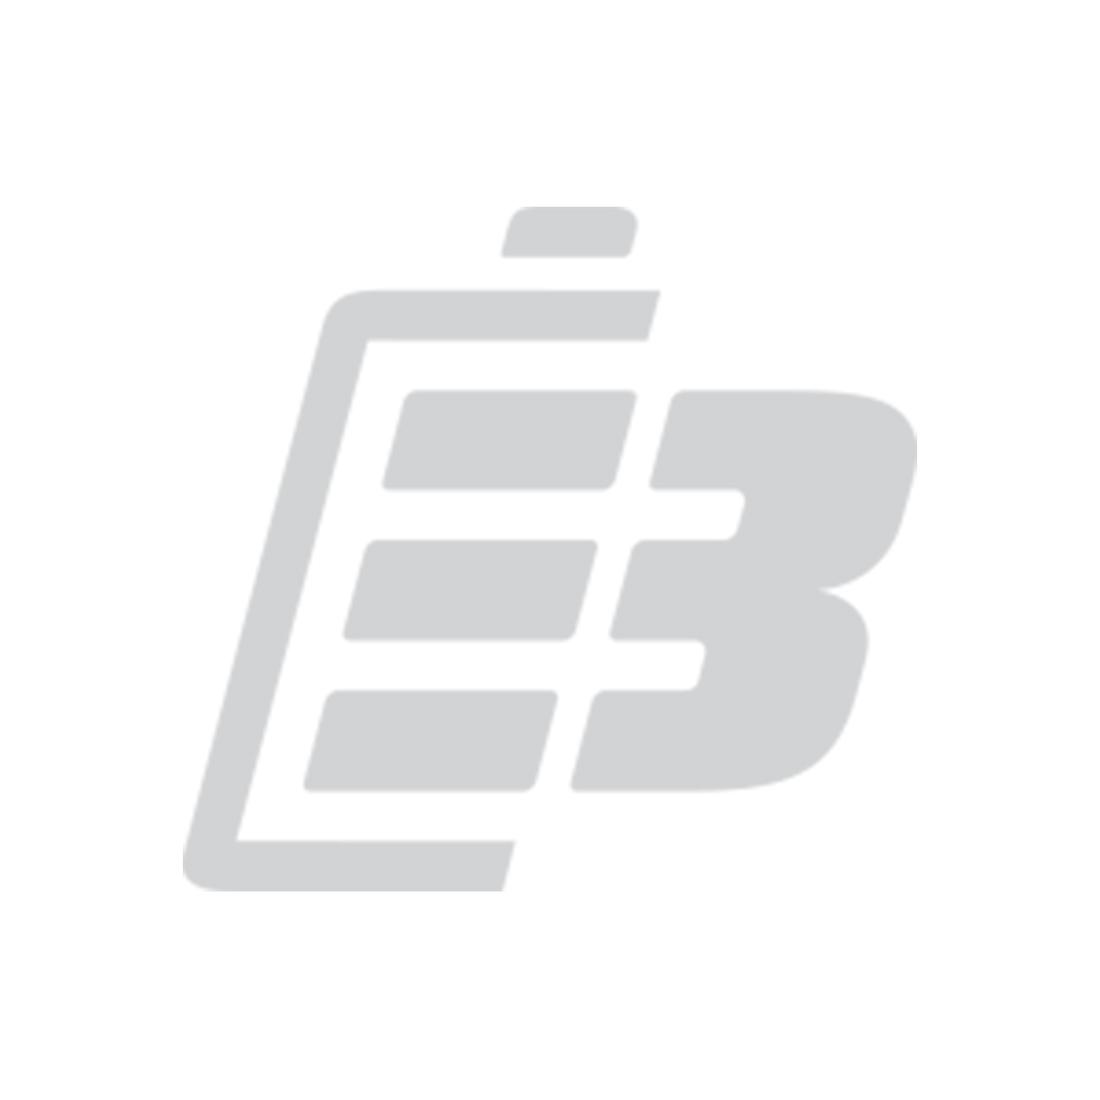 imacRC JST XH Adapter 1